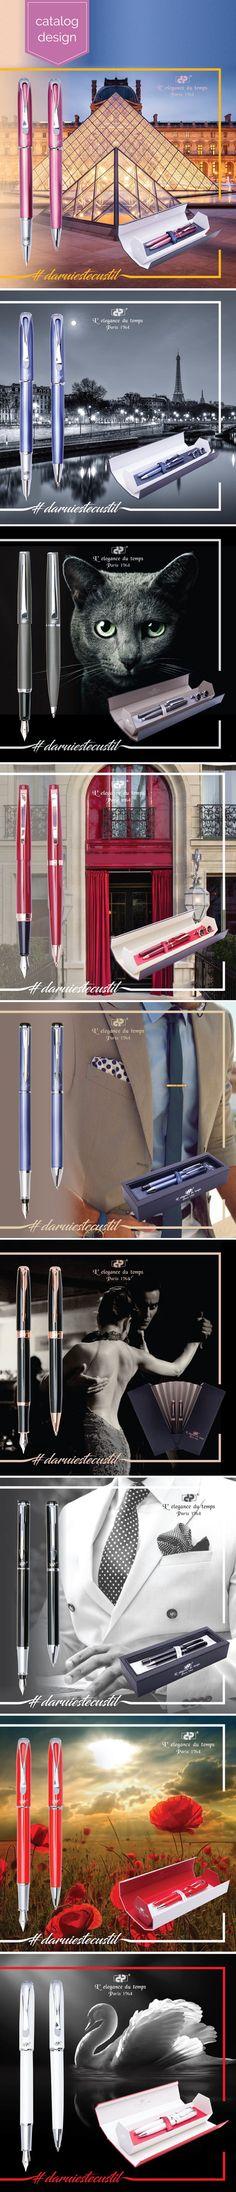 Catalog design for luxury writing instruments Catalog Design, Writing Instruments, Creative Design, Luxury